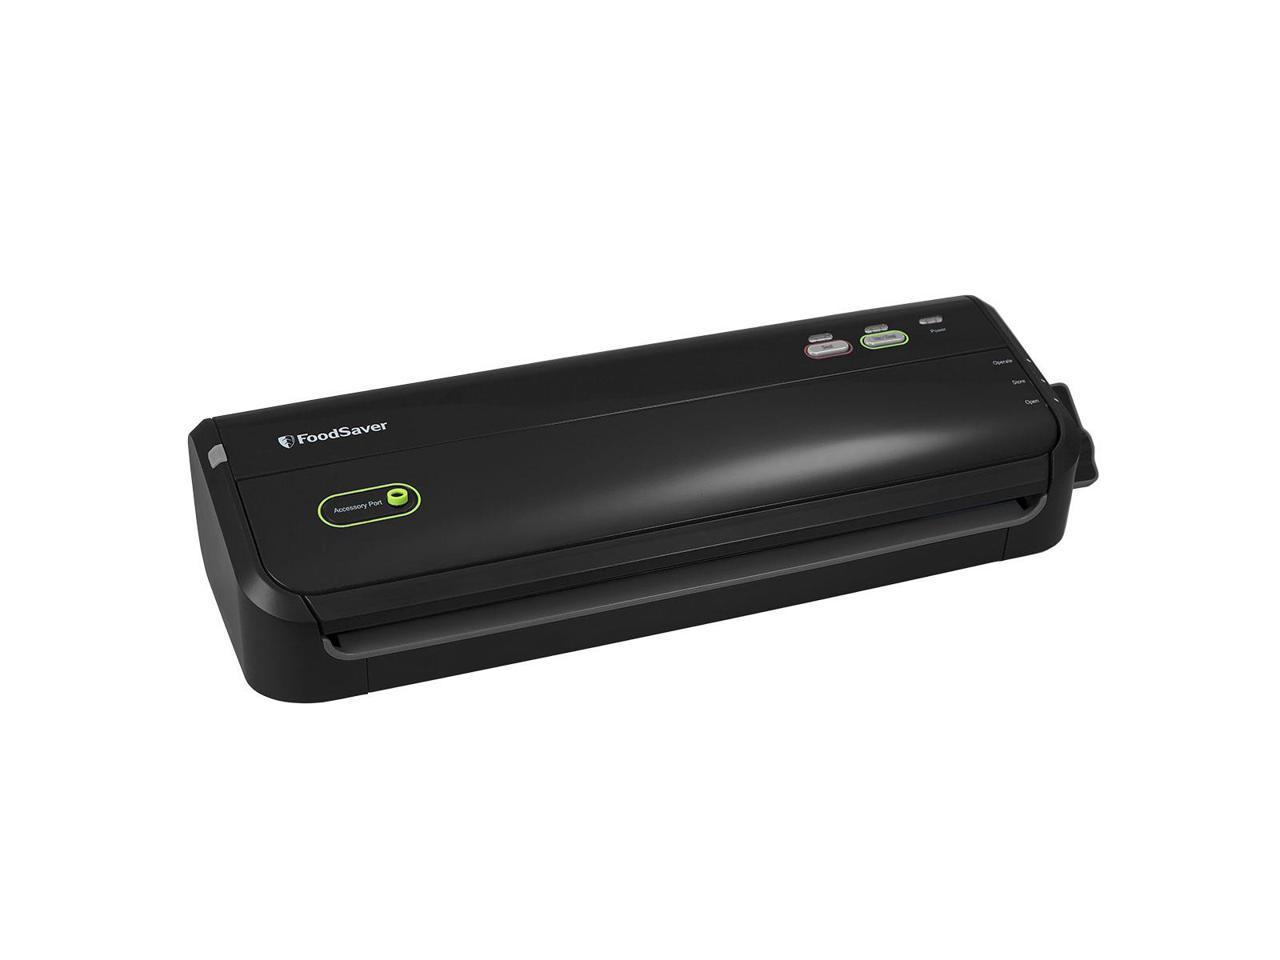 FoodSaver FM2052 Vacuum Sealing System (Black) + FoodSaver Container Flap Valve